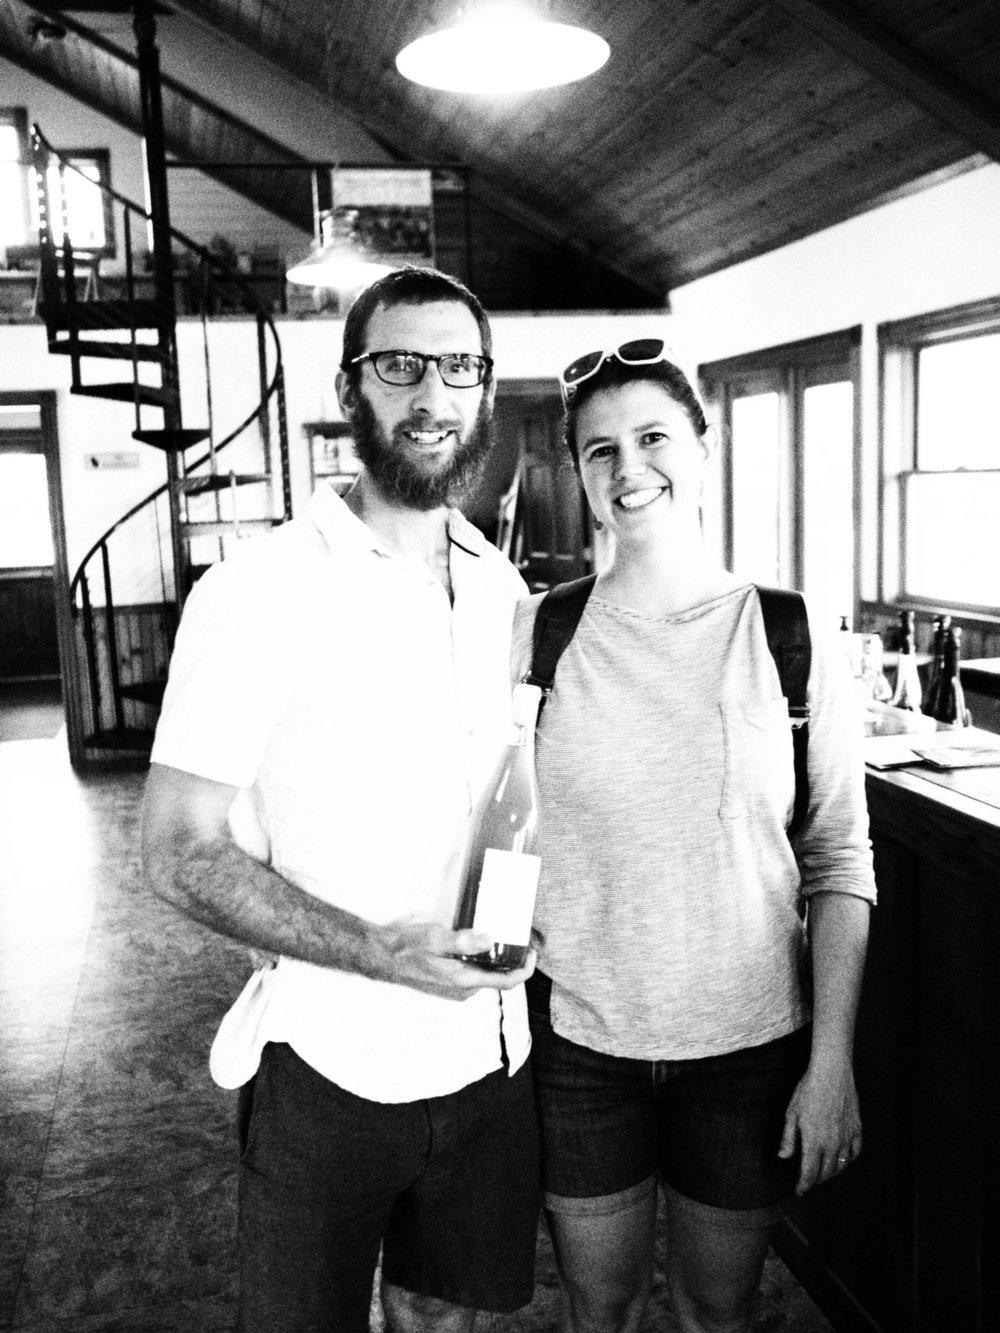 Ethan Joseph and Jessica DeBiasio